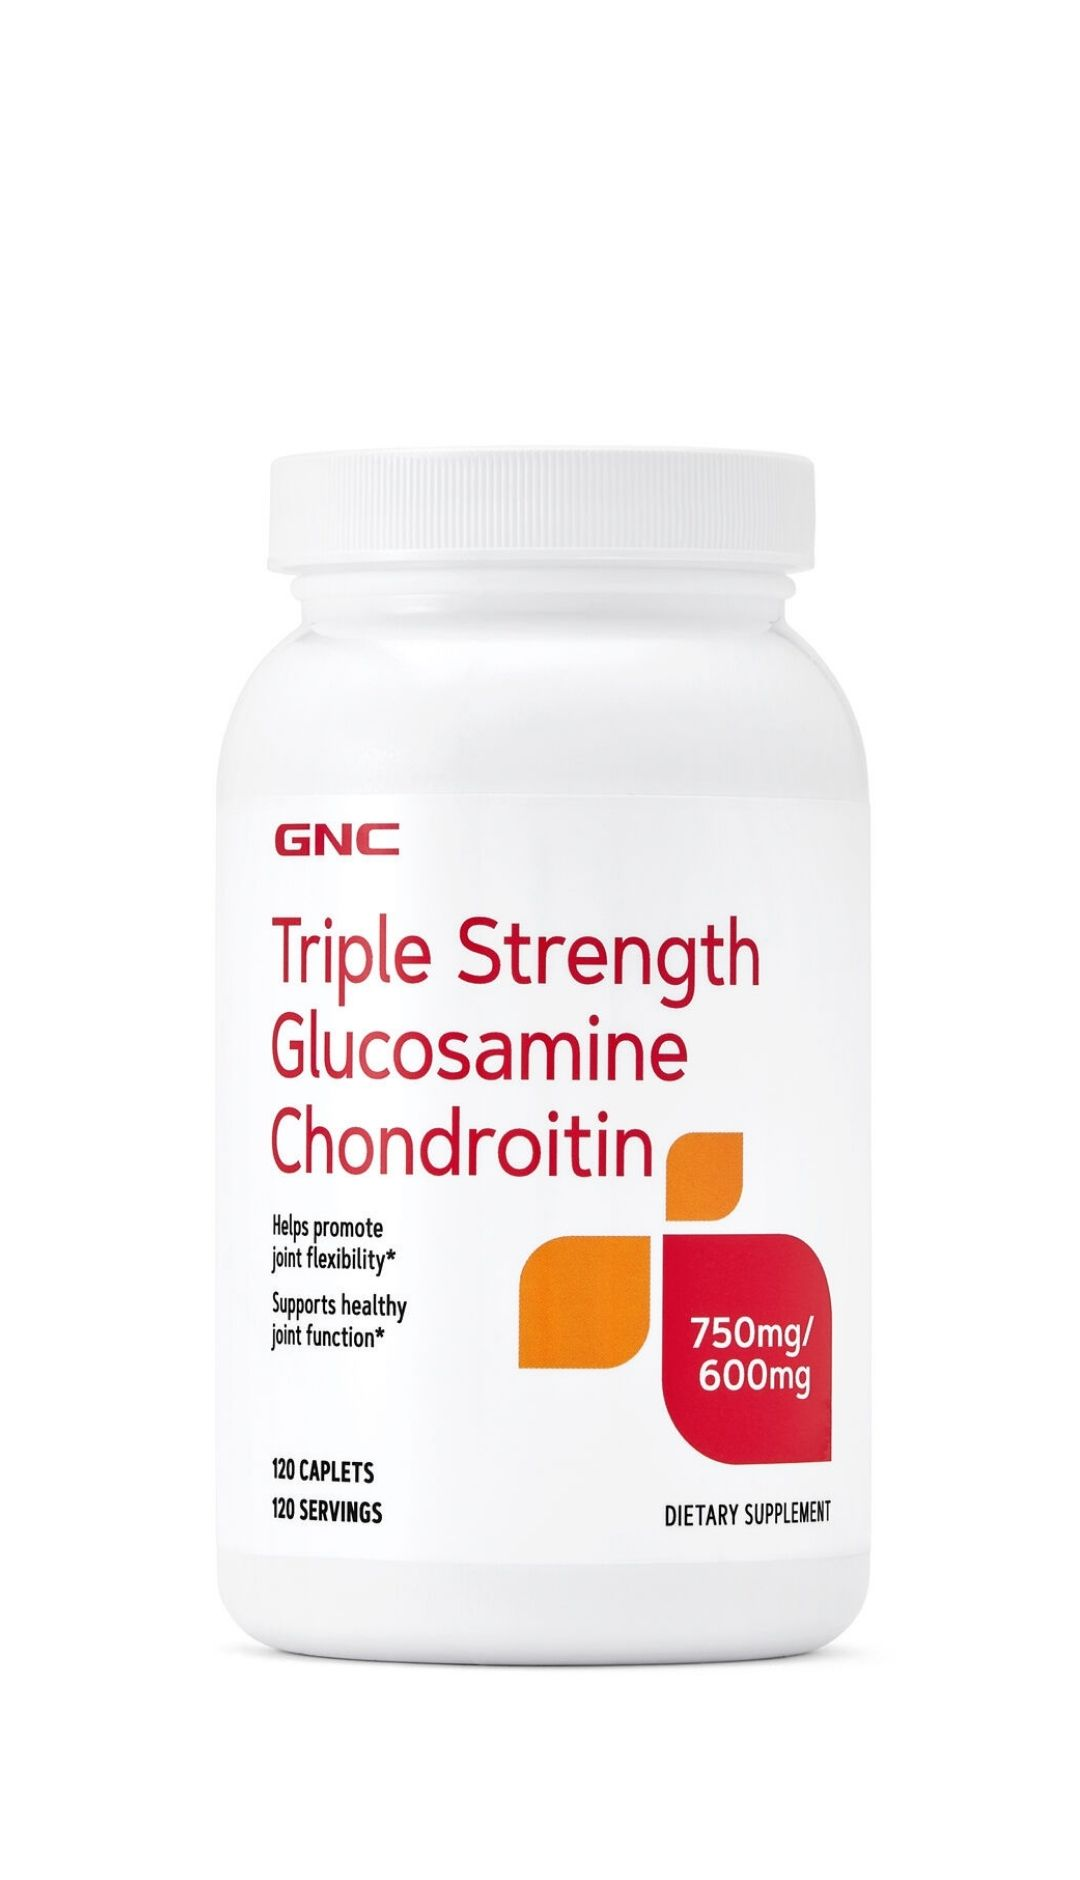 Triple Strength Glucosamine Chondroitin (120s)